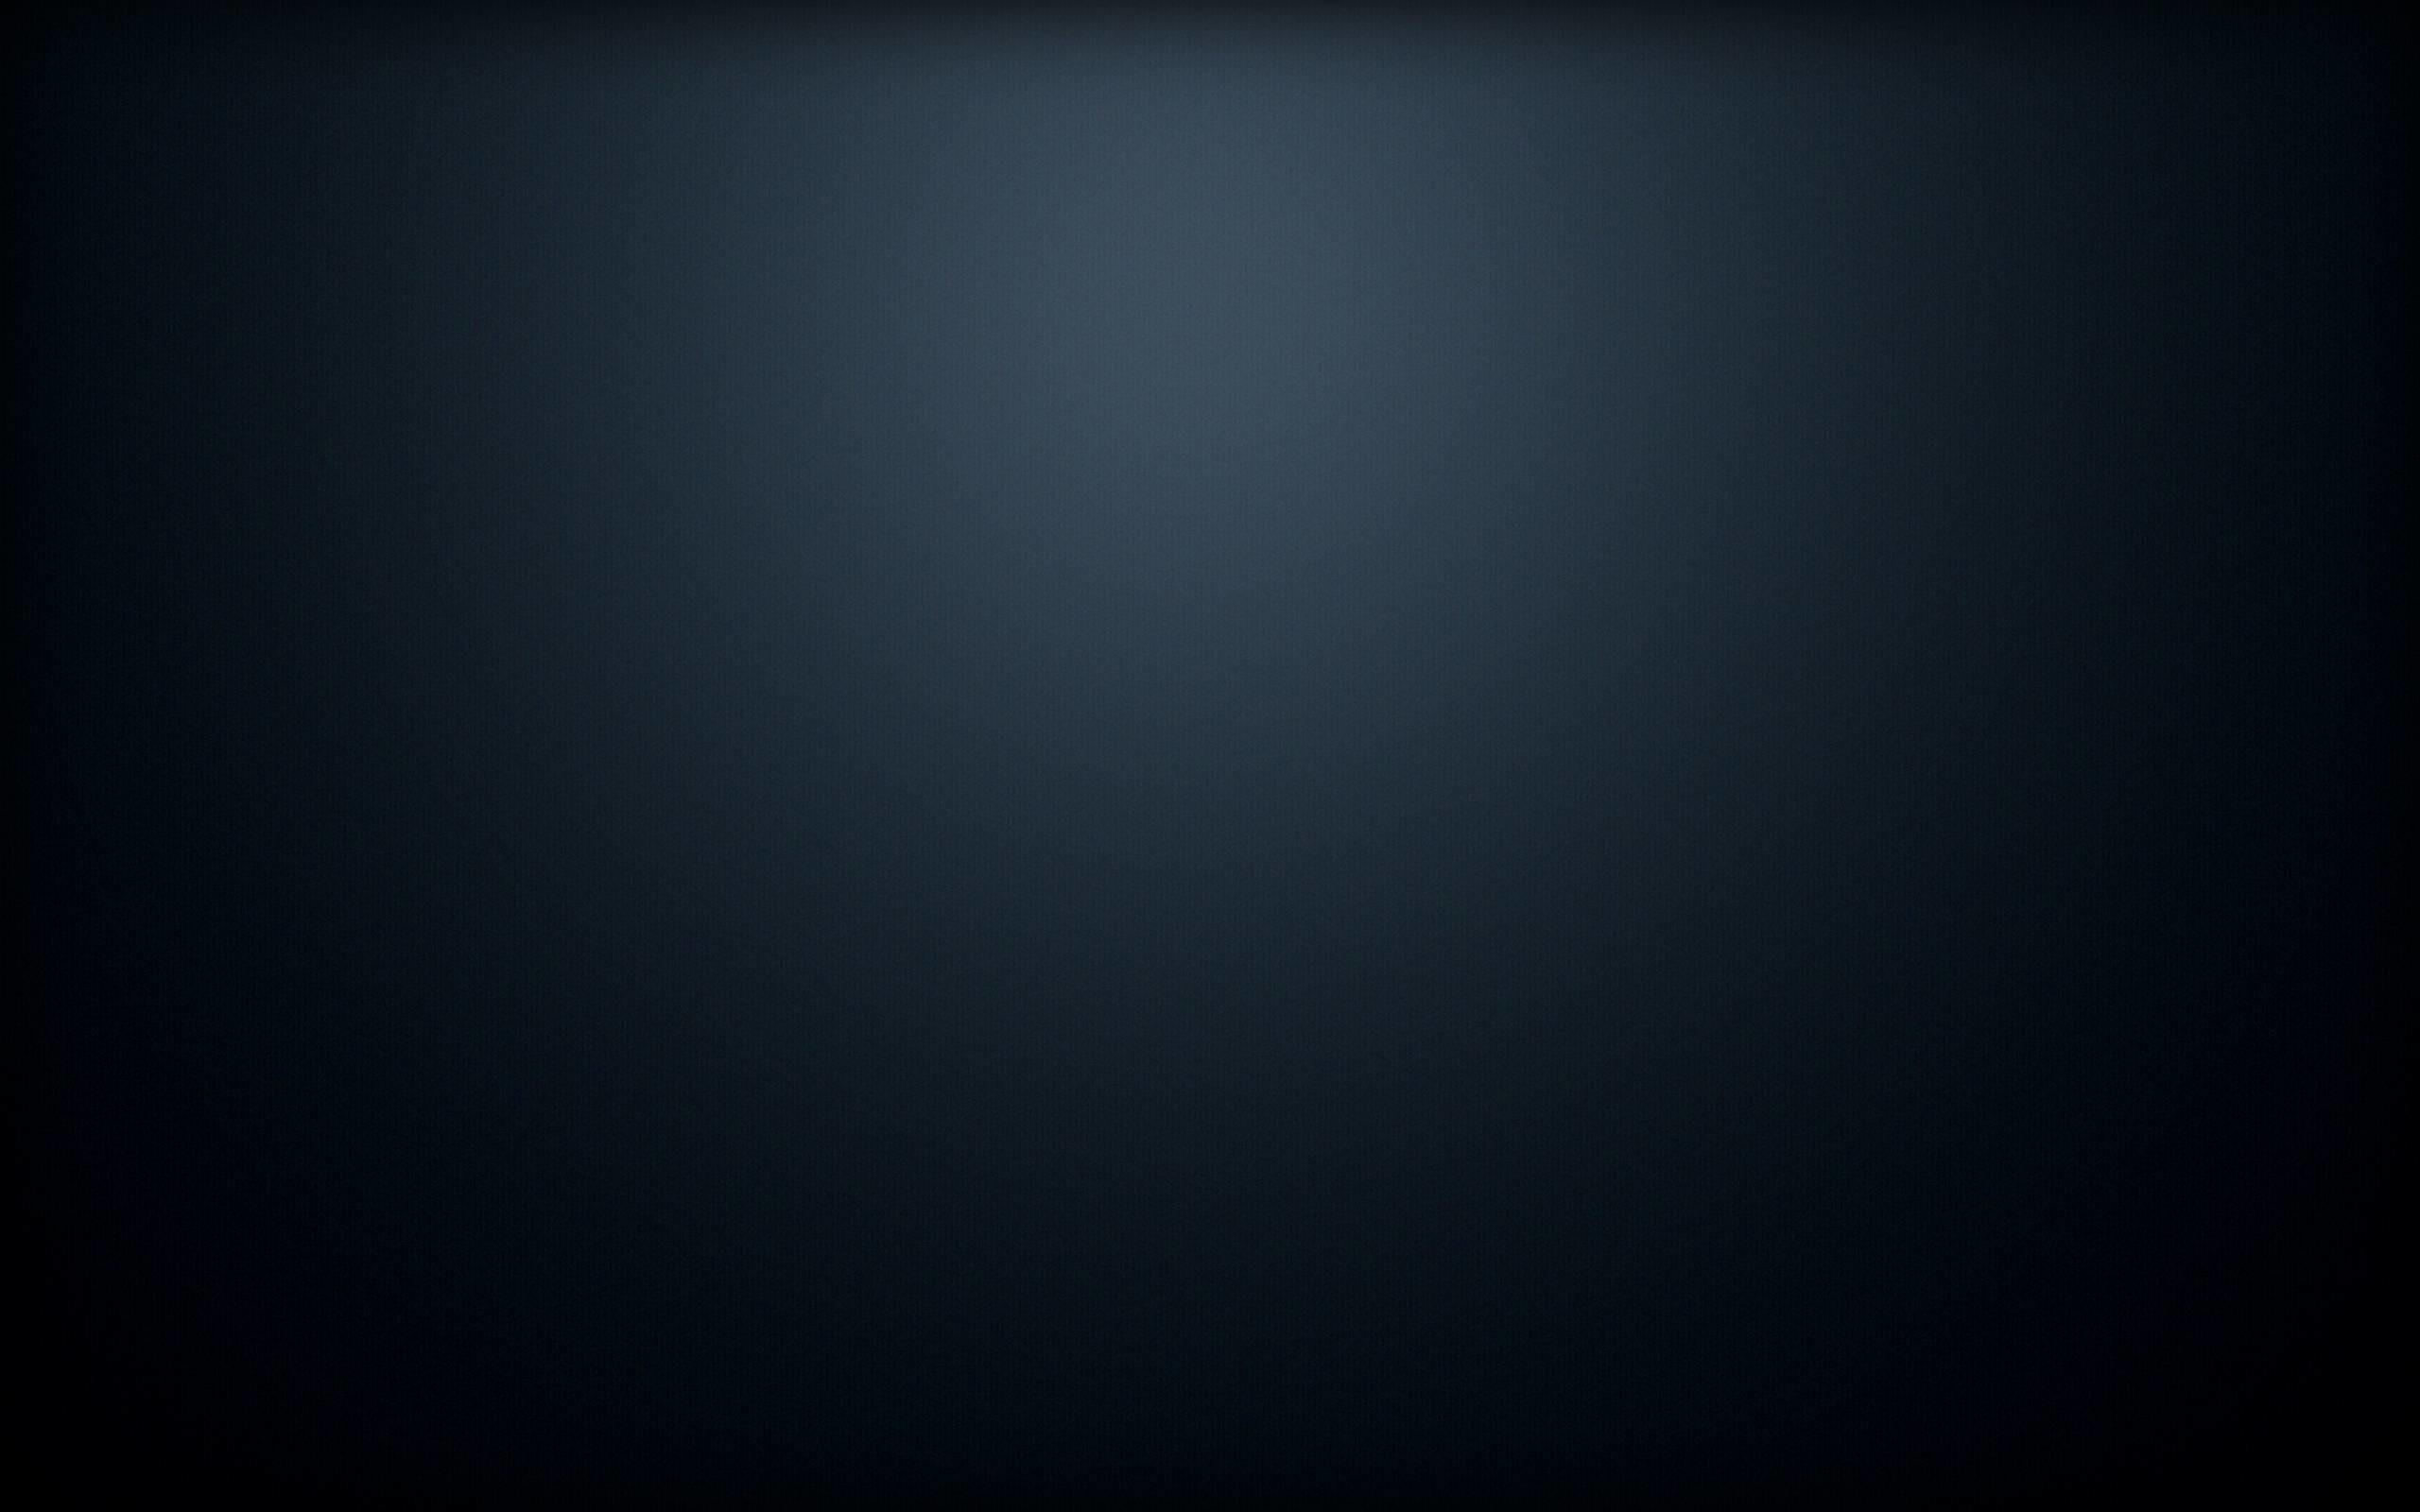 Blue Hd Wallpaper: Dark Blue Hd Wallpaper #2266  .Ssofc